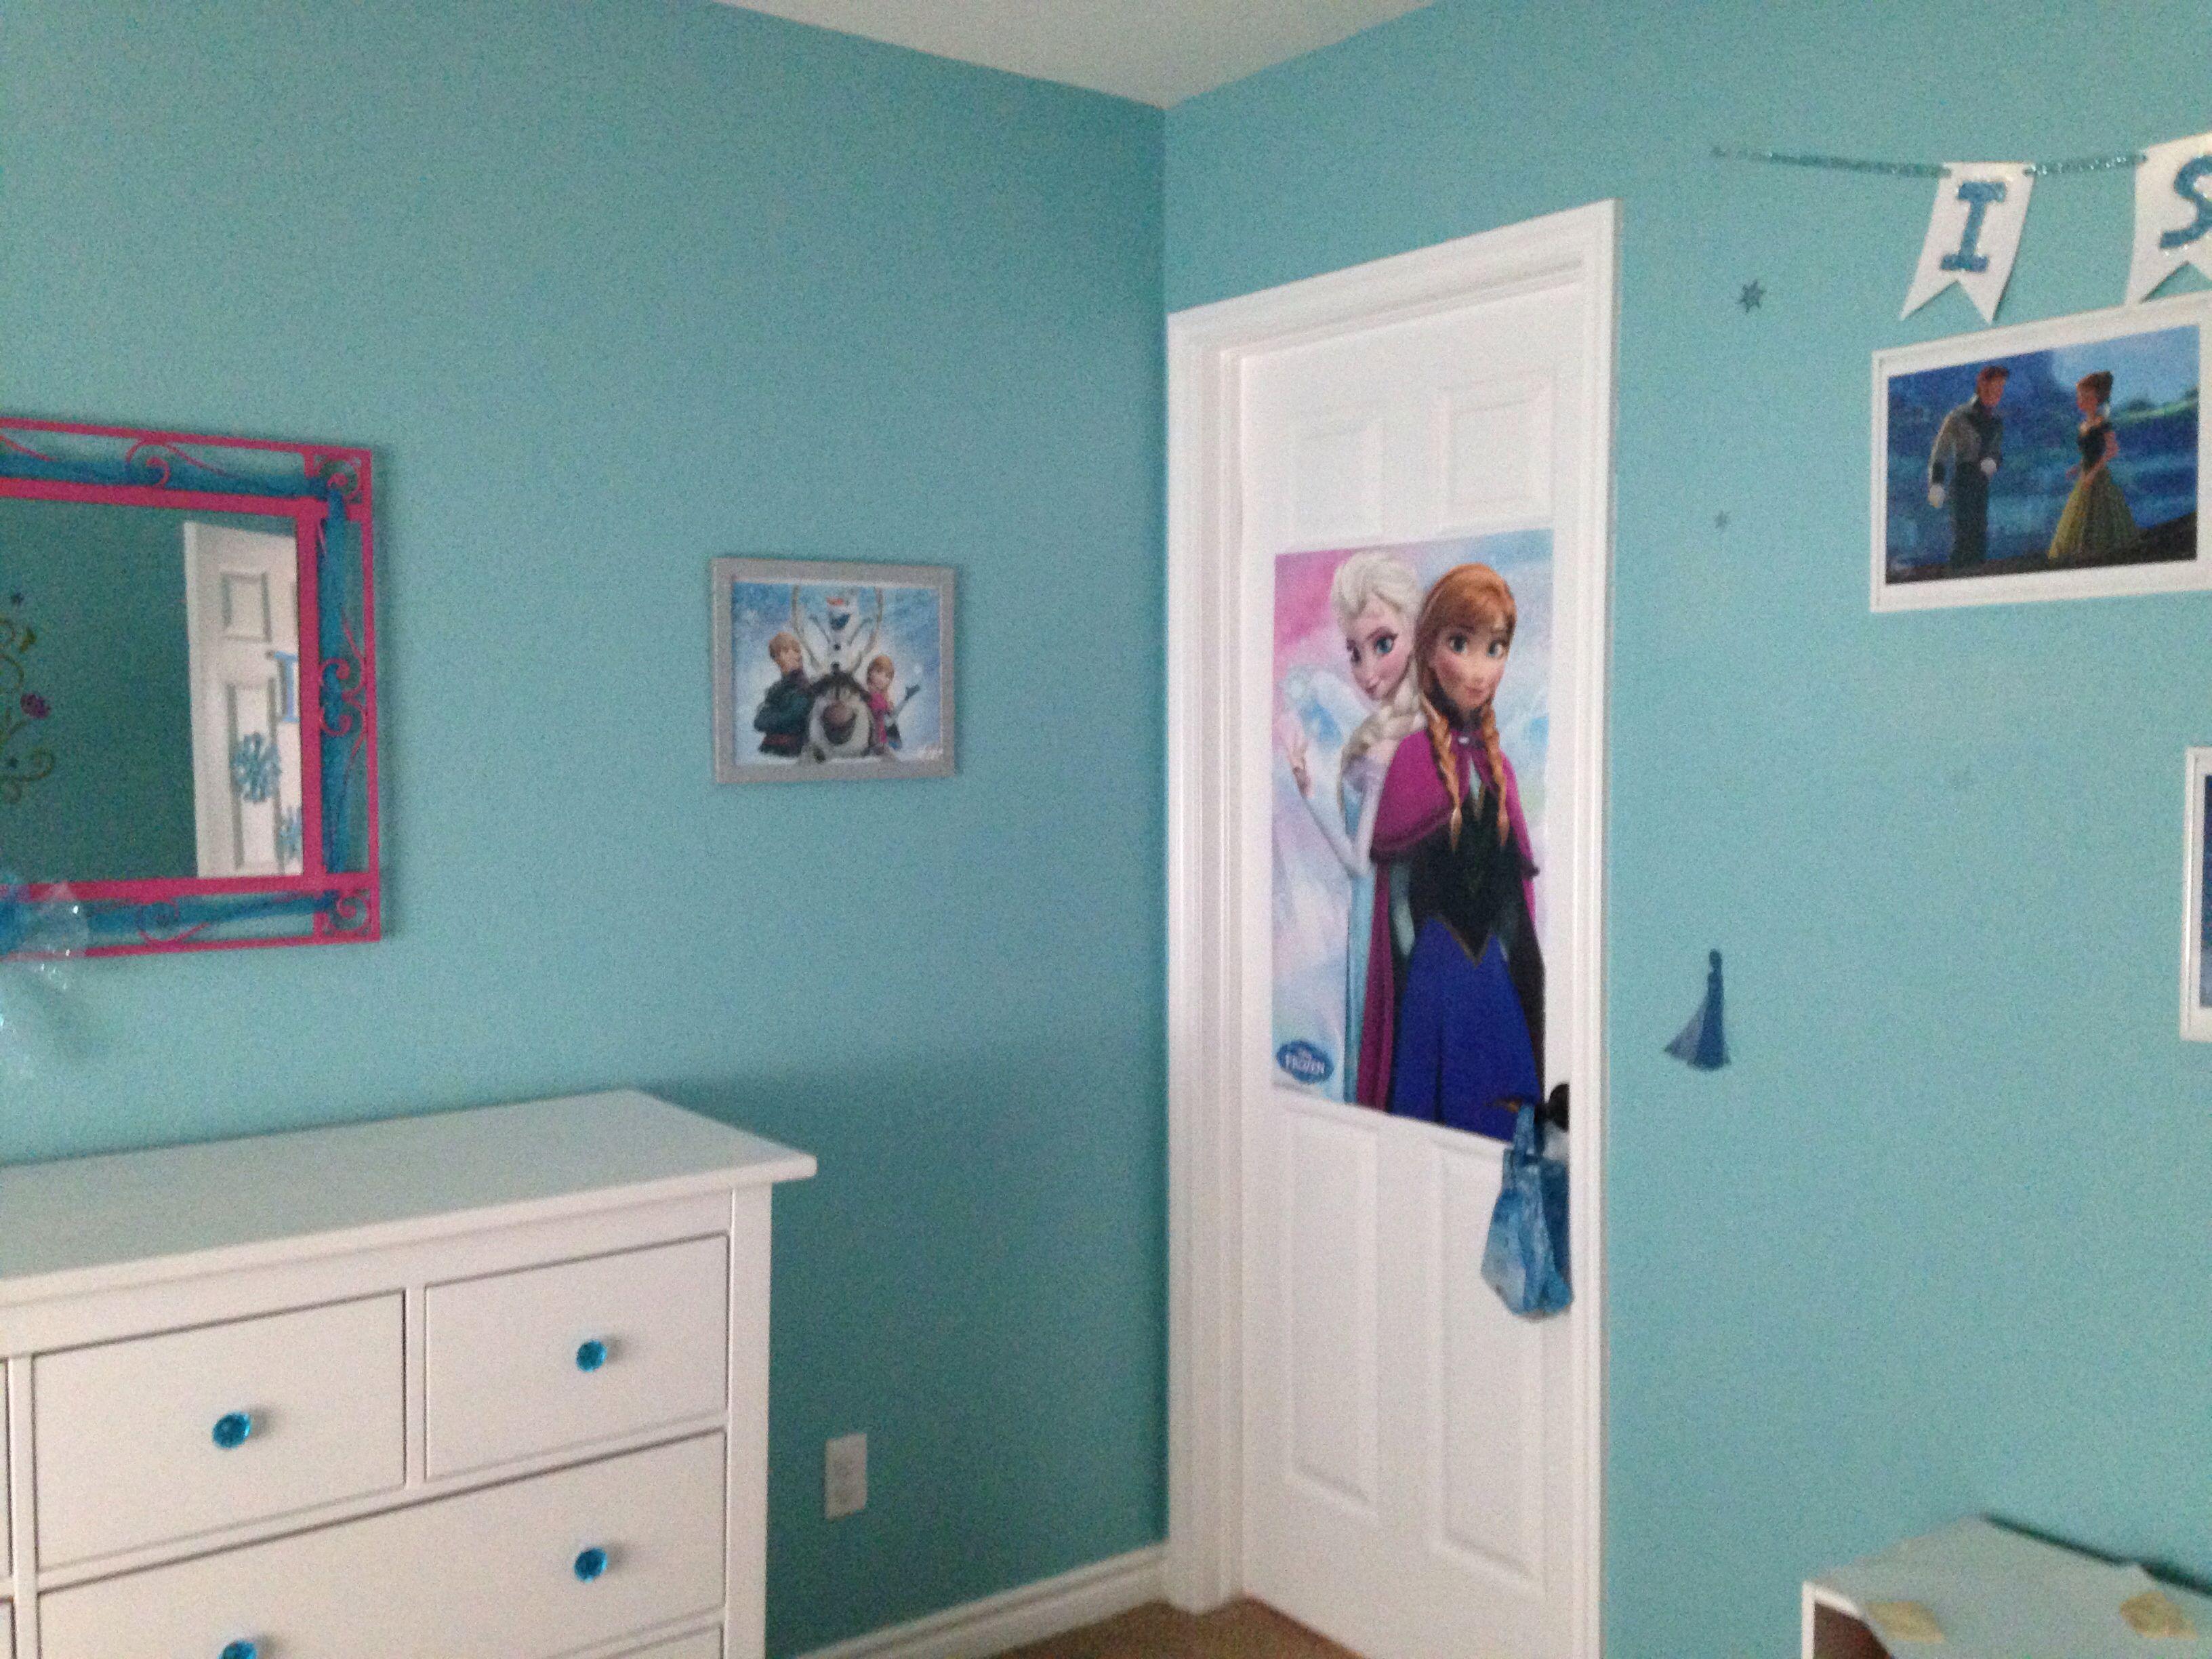 Frozen inspired bedroom - Disney S Frozen Inspired Bedroom Poster From Michael S Prints From Disney Store In Silver Glitter